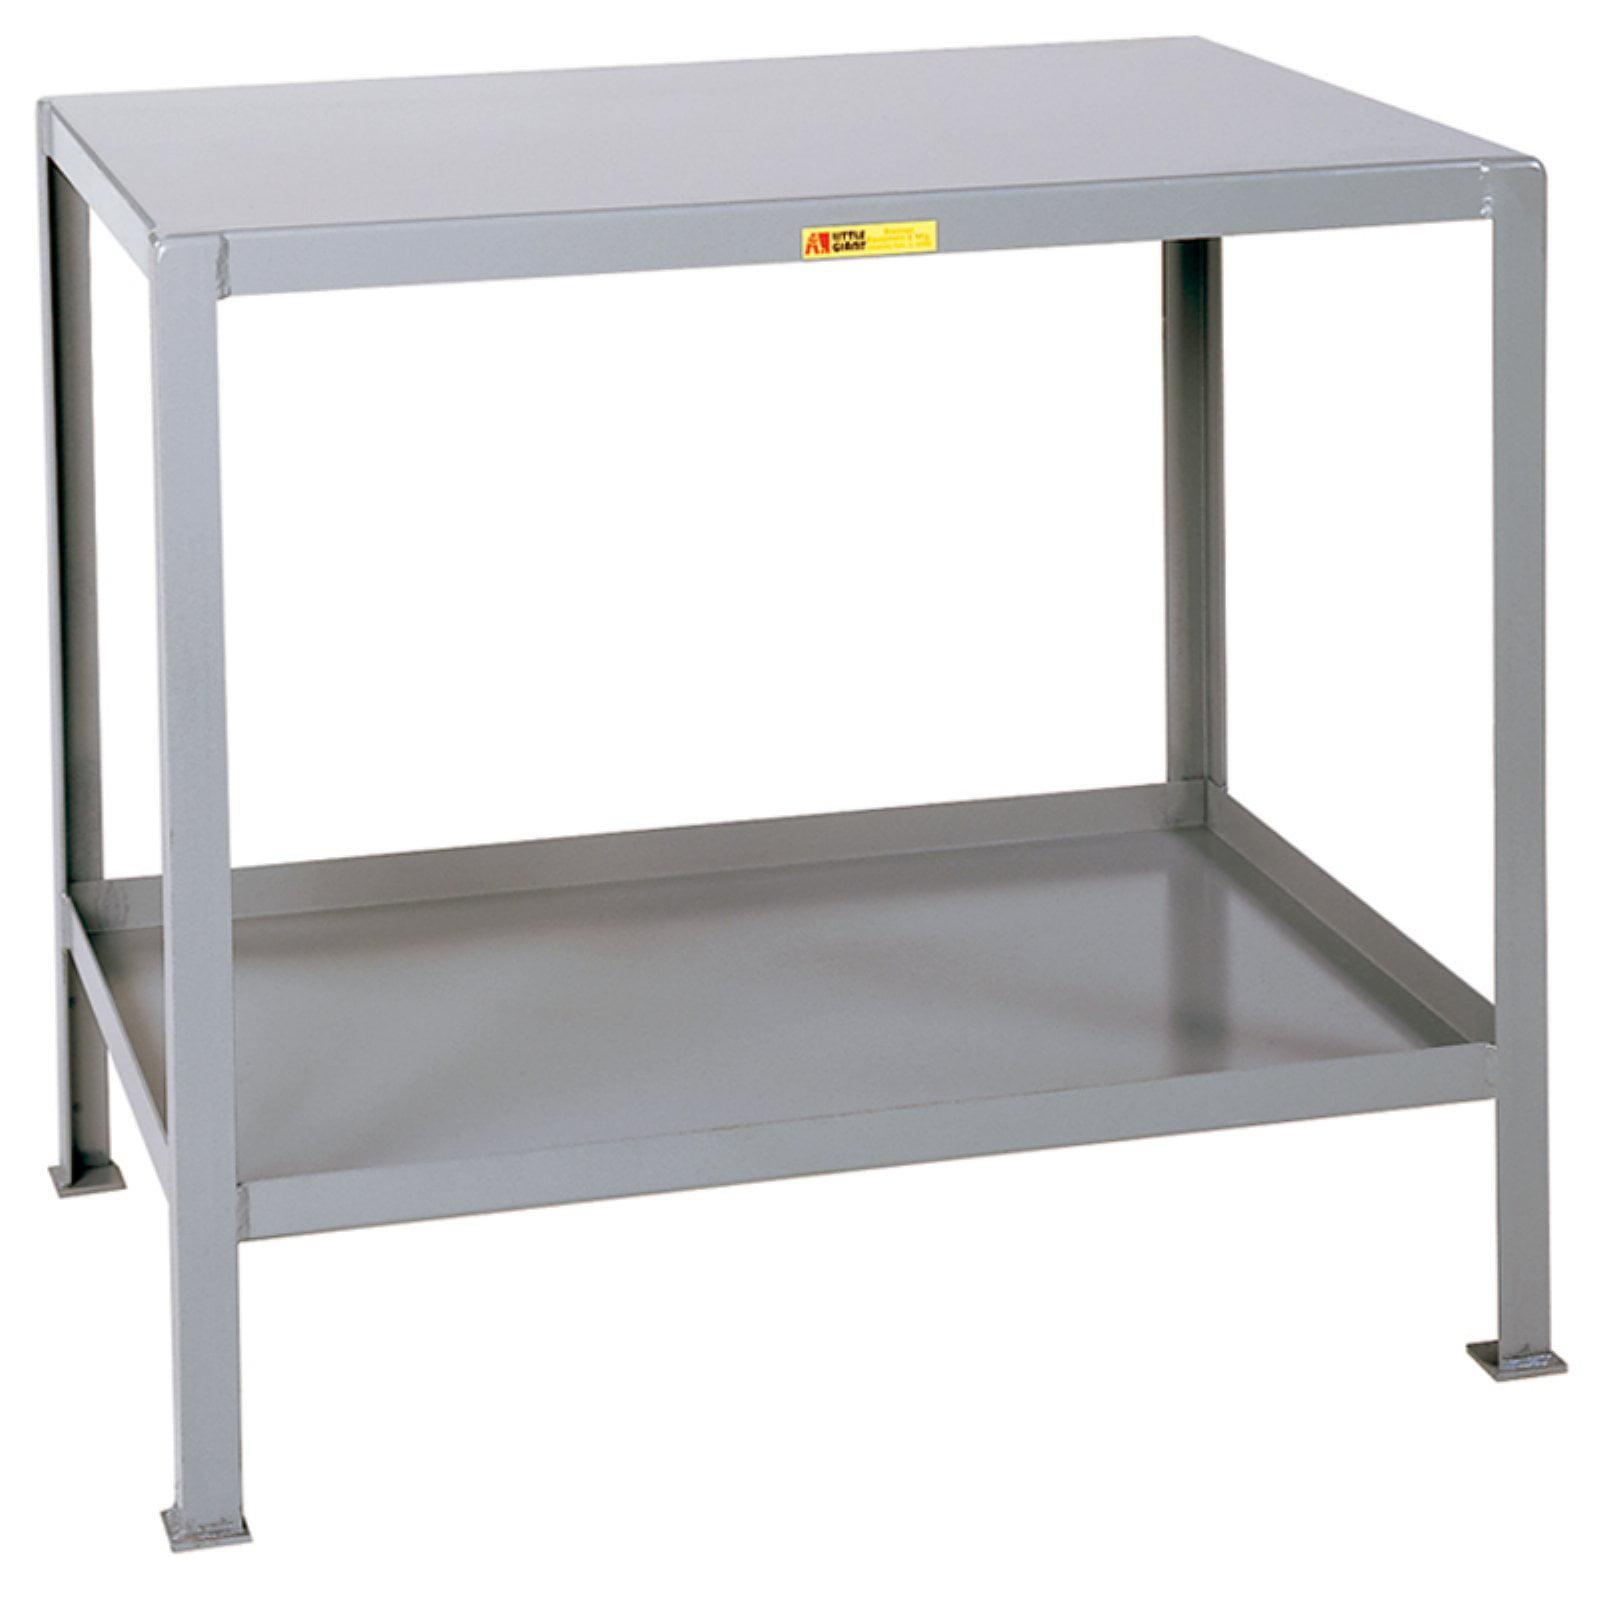 Little Giant Steel Machine Table with Shelf